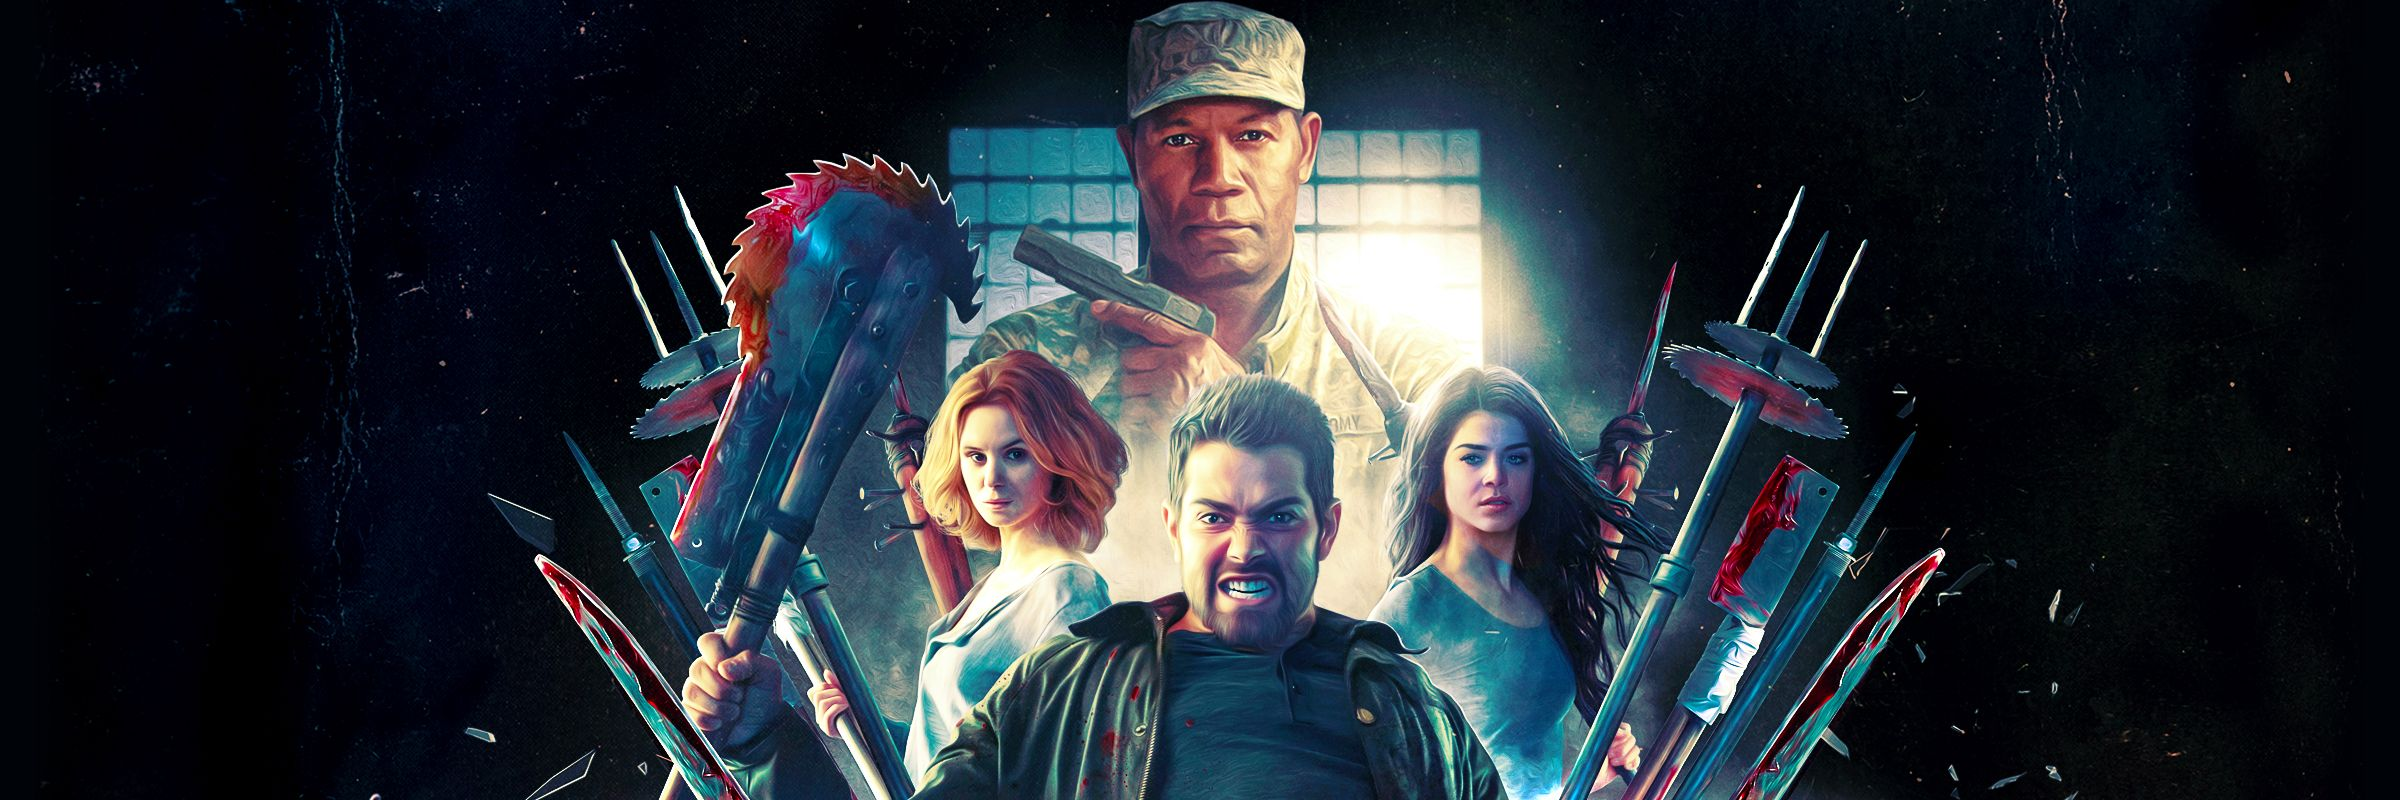 Dead Rising Endgame Full Movie Movies Anywhere